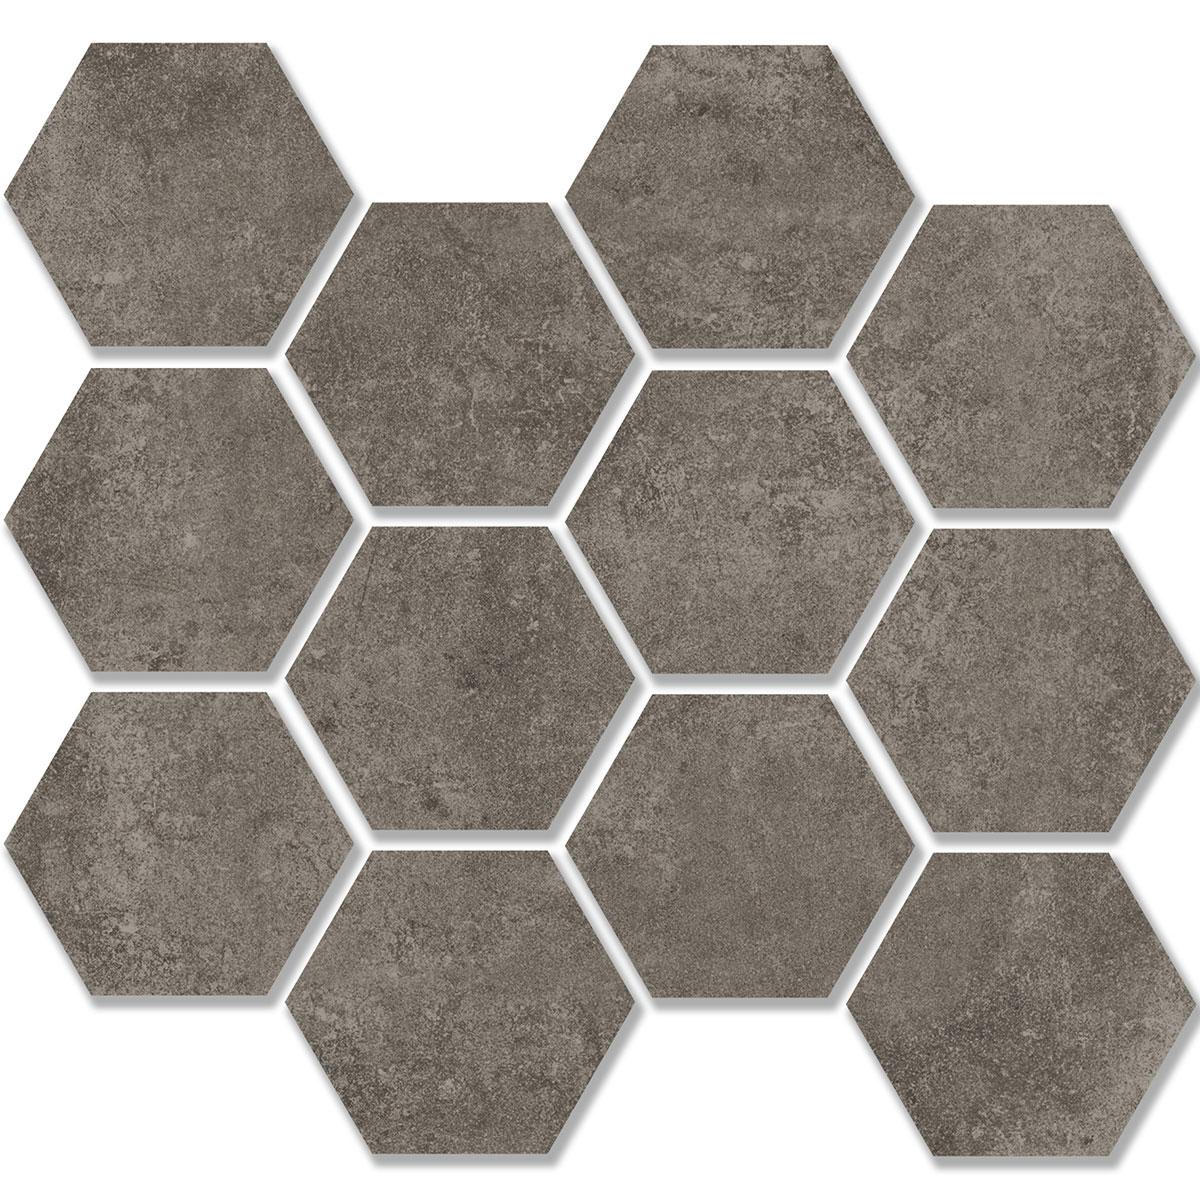 CAPETOWN timeless grey (graubraun) HEXA Image